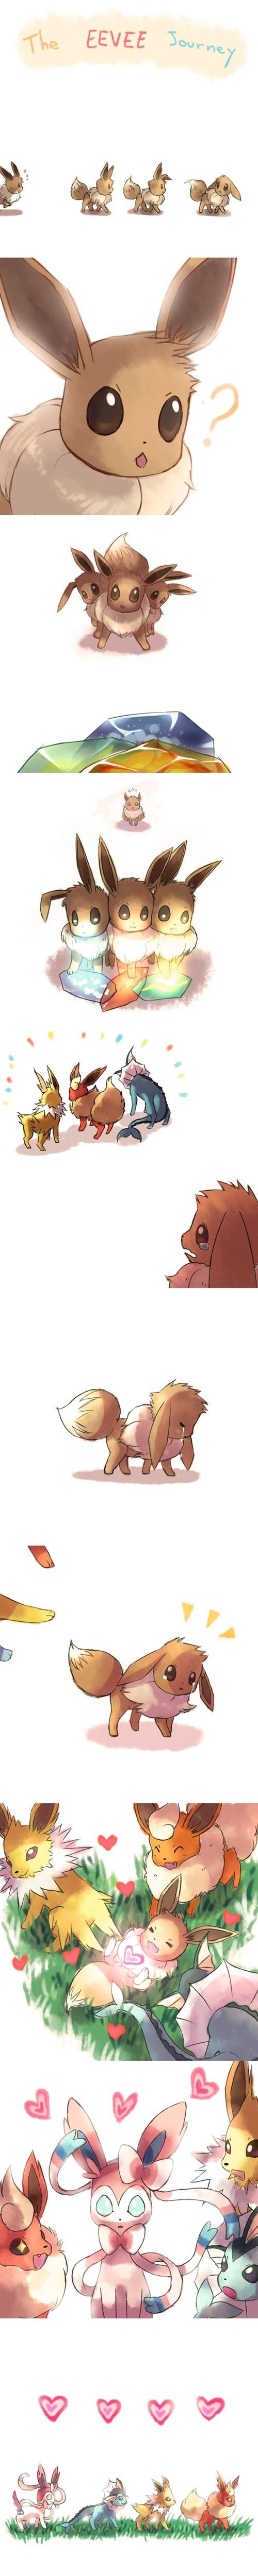 pokemon memes eevee journey